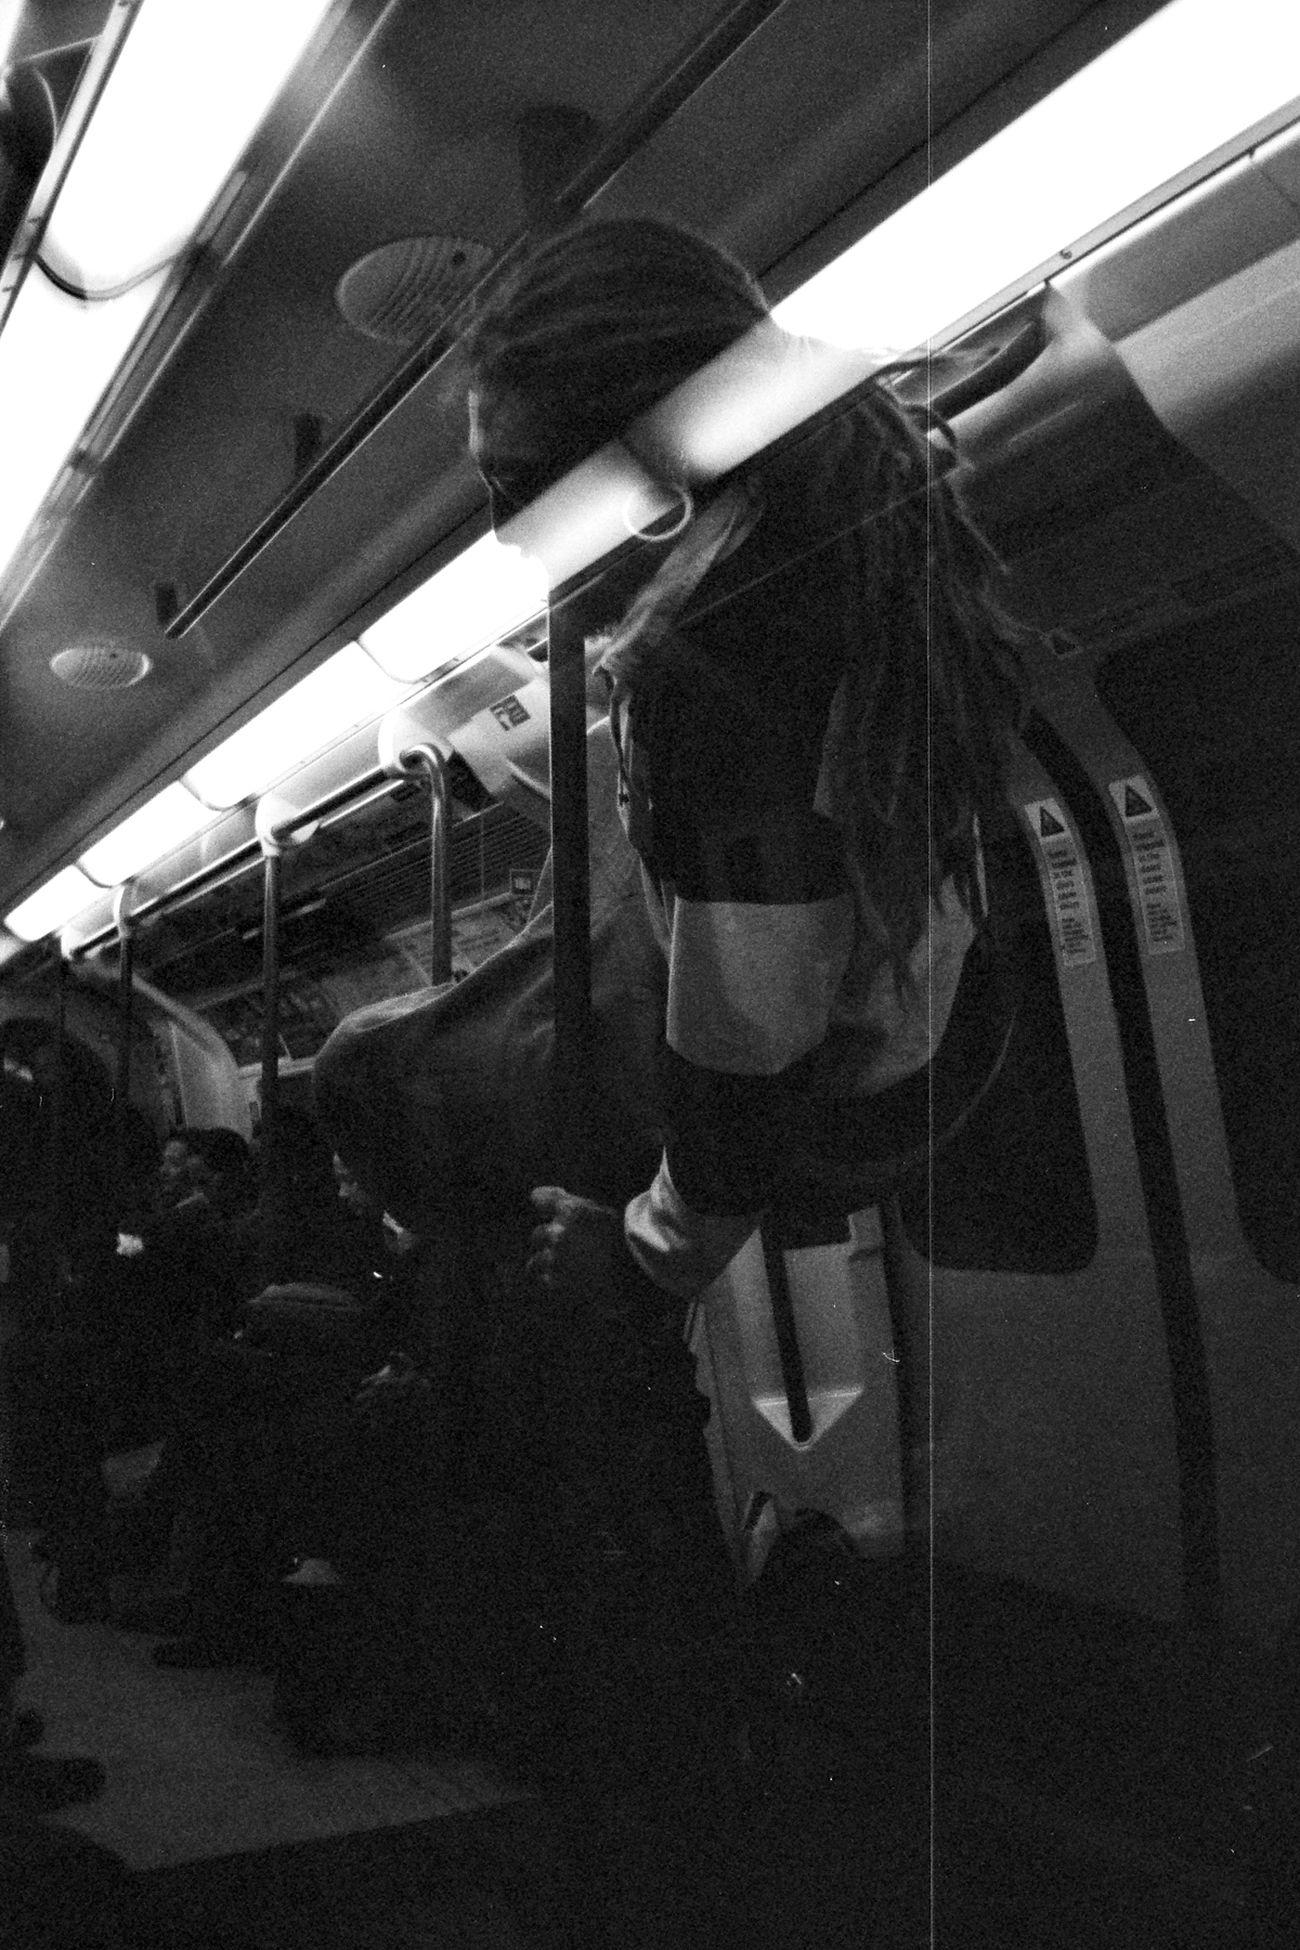 Adult Blackandwhite Bw Camden Town Station Dread Dreadlocks Dreads Fun Funny Hanging Indoors  Light London Lifestyle Mode Of Transport Monkey Business Passenger Train People Public Transportation Rail Transportation RASTA Rastafari Train - Vehicle Transportation Travel Underground